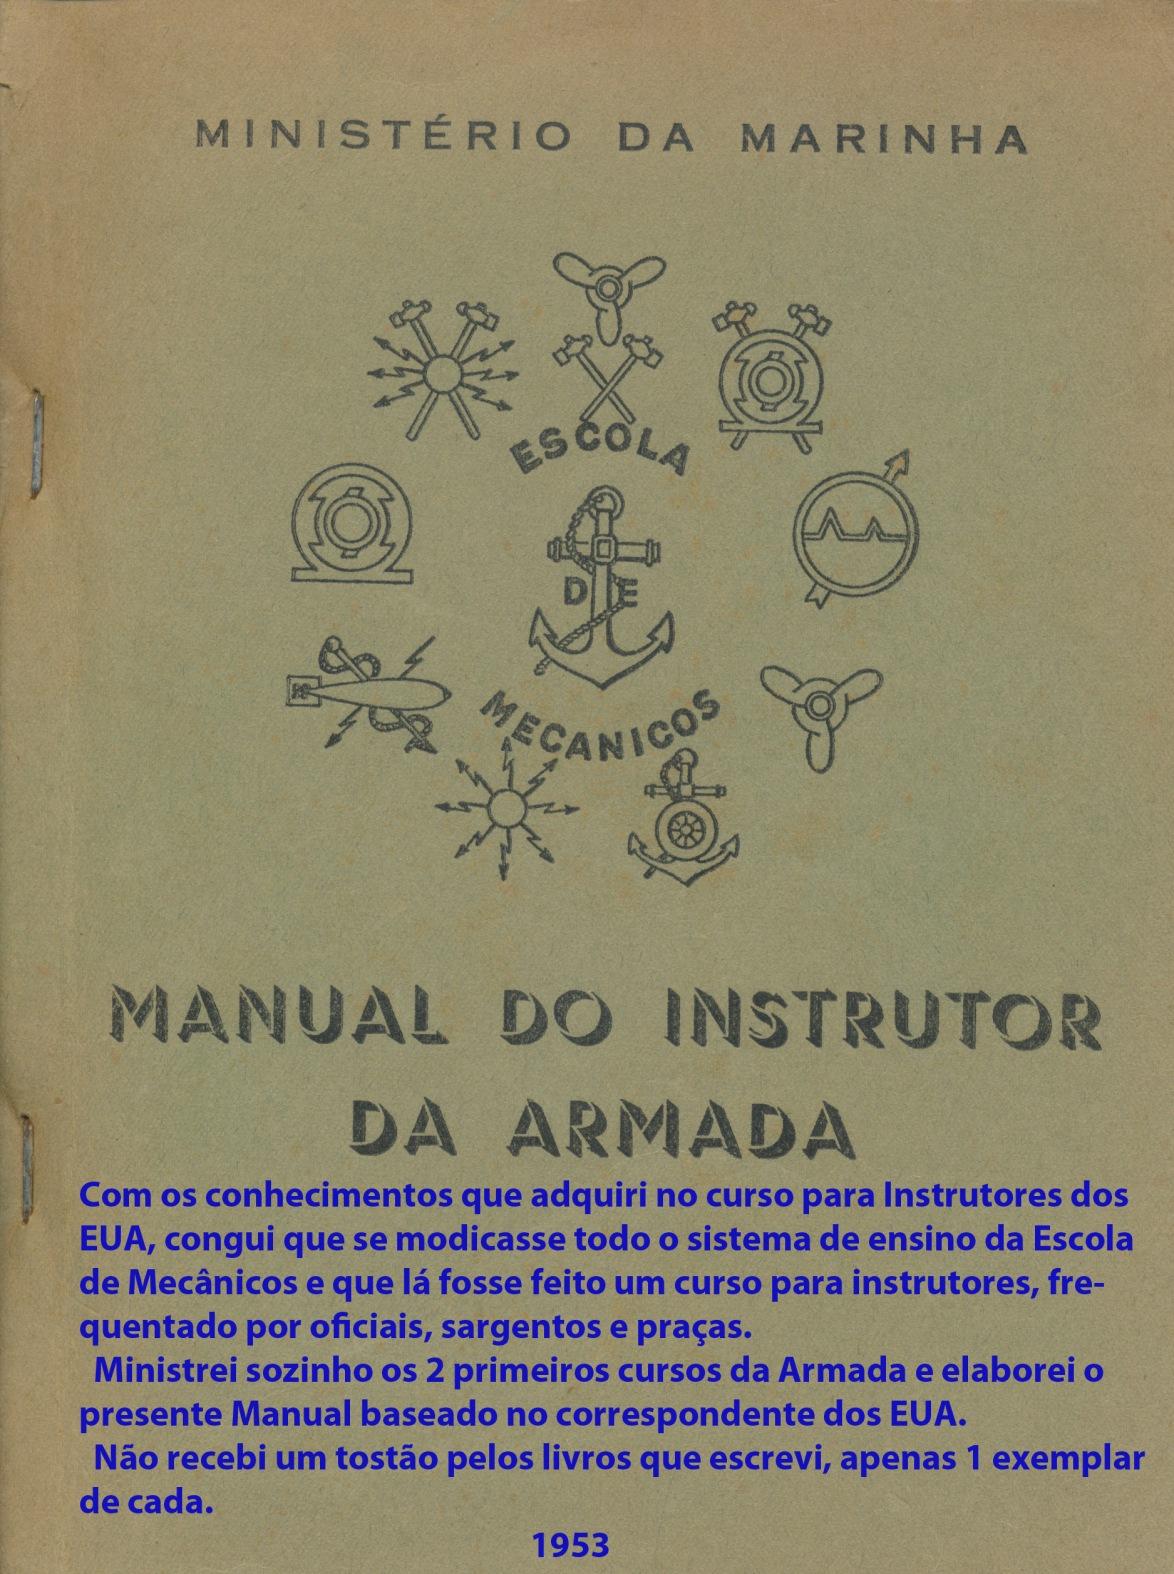 00256 953 Manual do Instrutor da Armada - capa